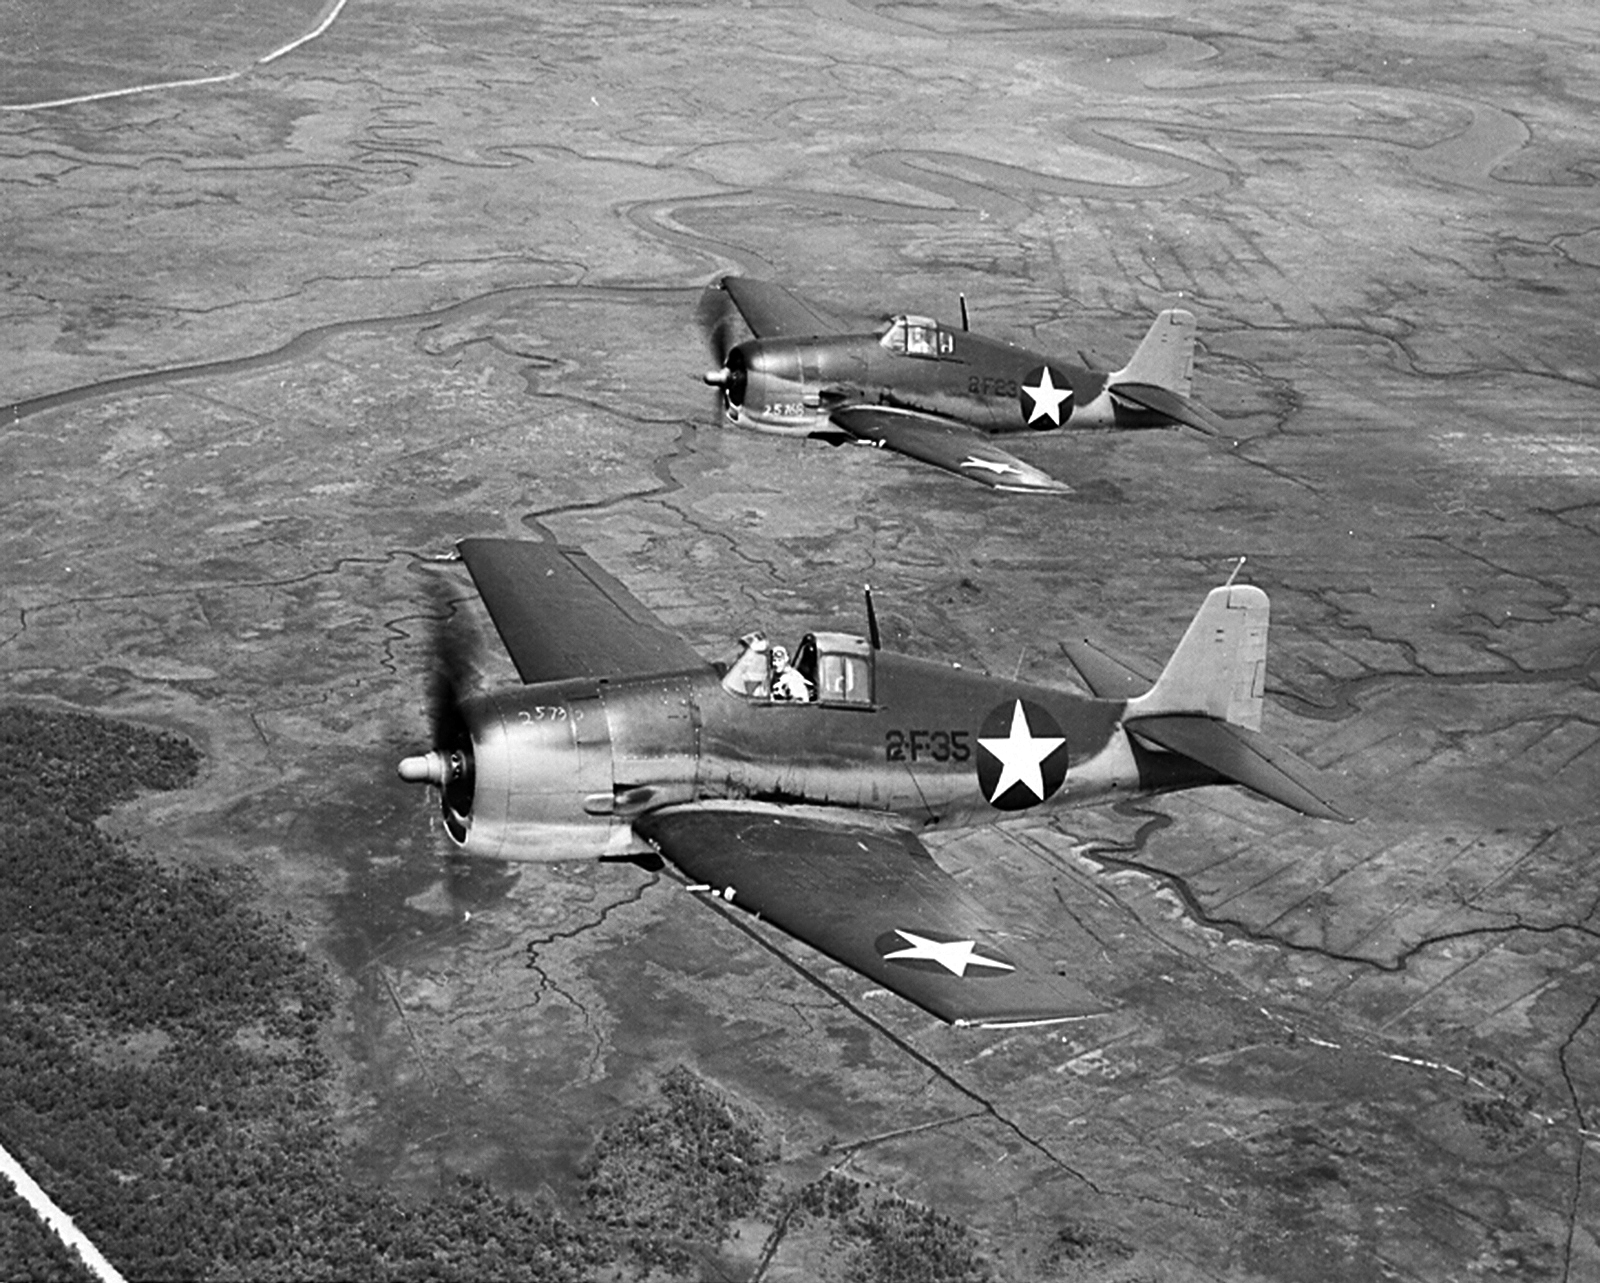 Grumman F6F 3 Hellcat VF 2 Black 35 and 23 USS Hornet CV 12 on patrol 1944 01